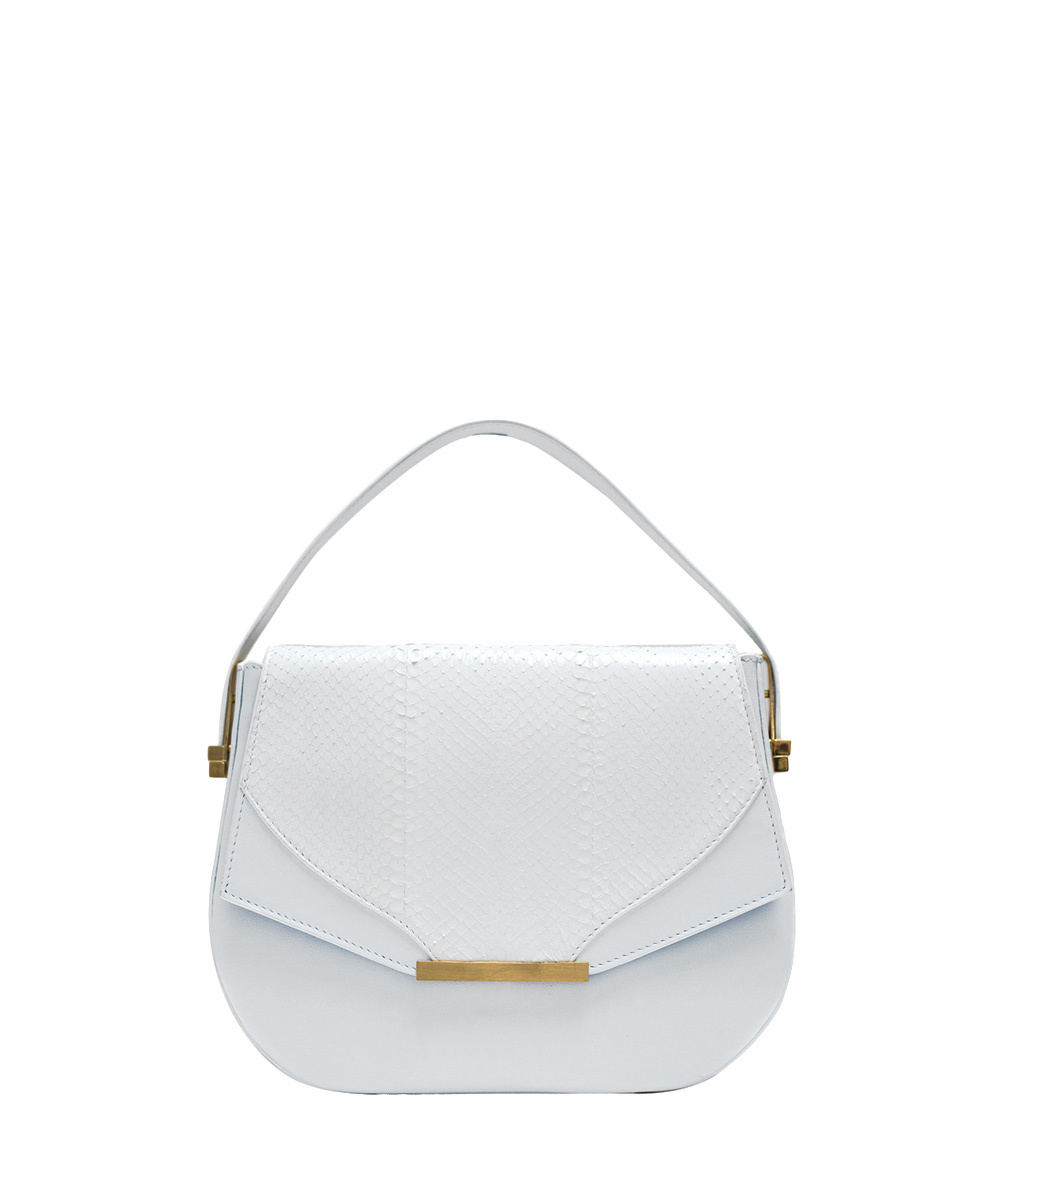 KHIRMA White Deedee Saddle Bag